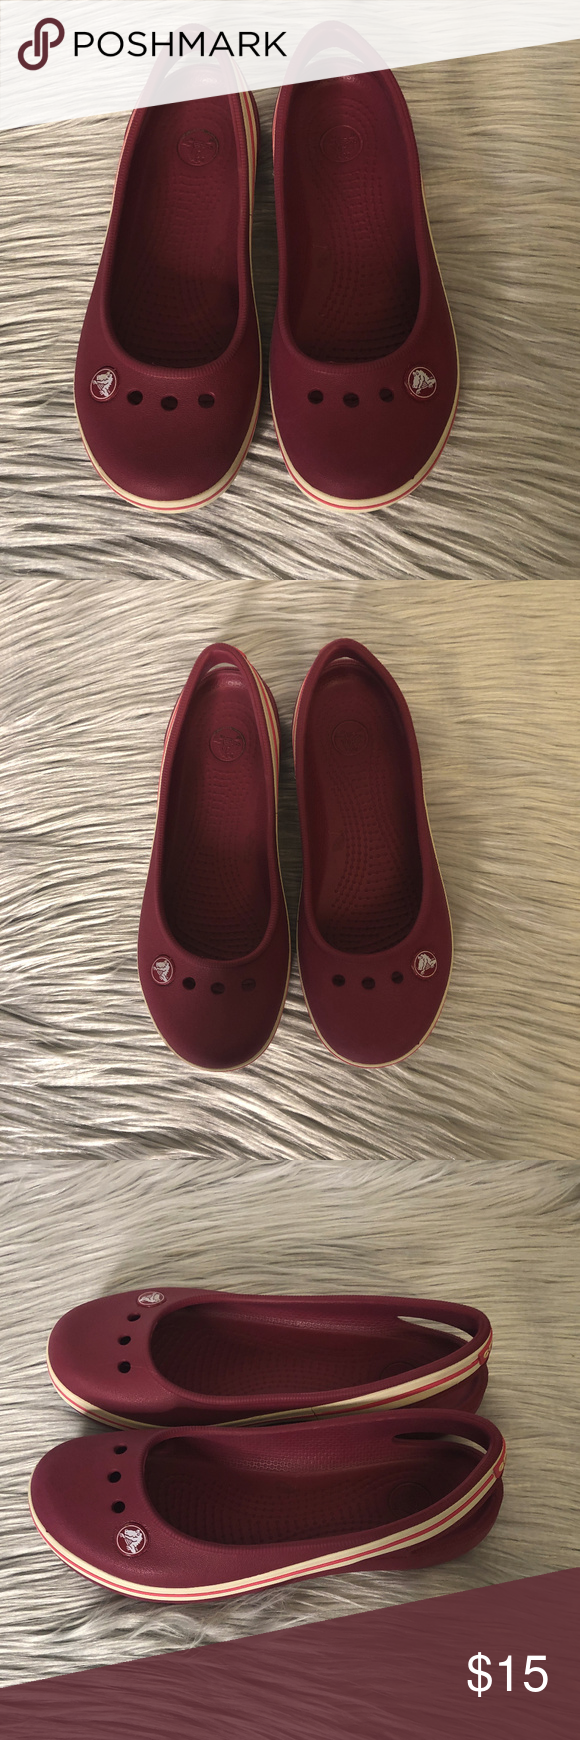 Girls Crocs Shoes | Crocs shoes, Shoes